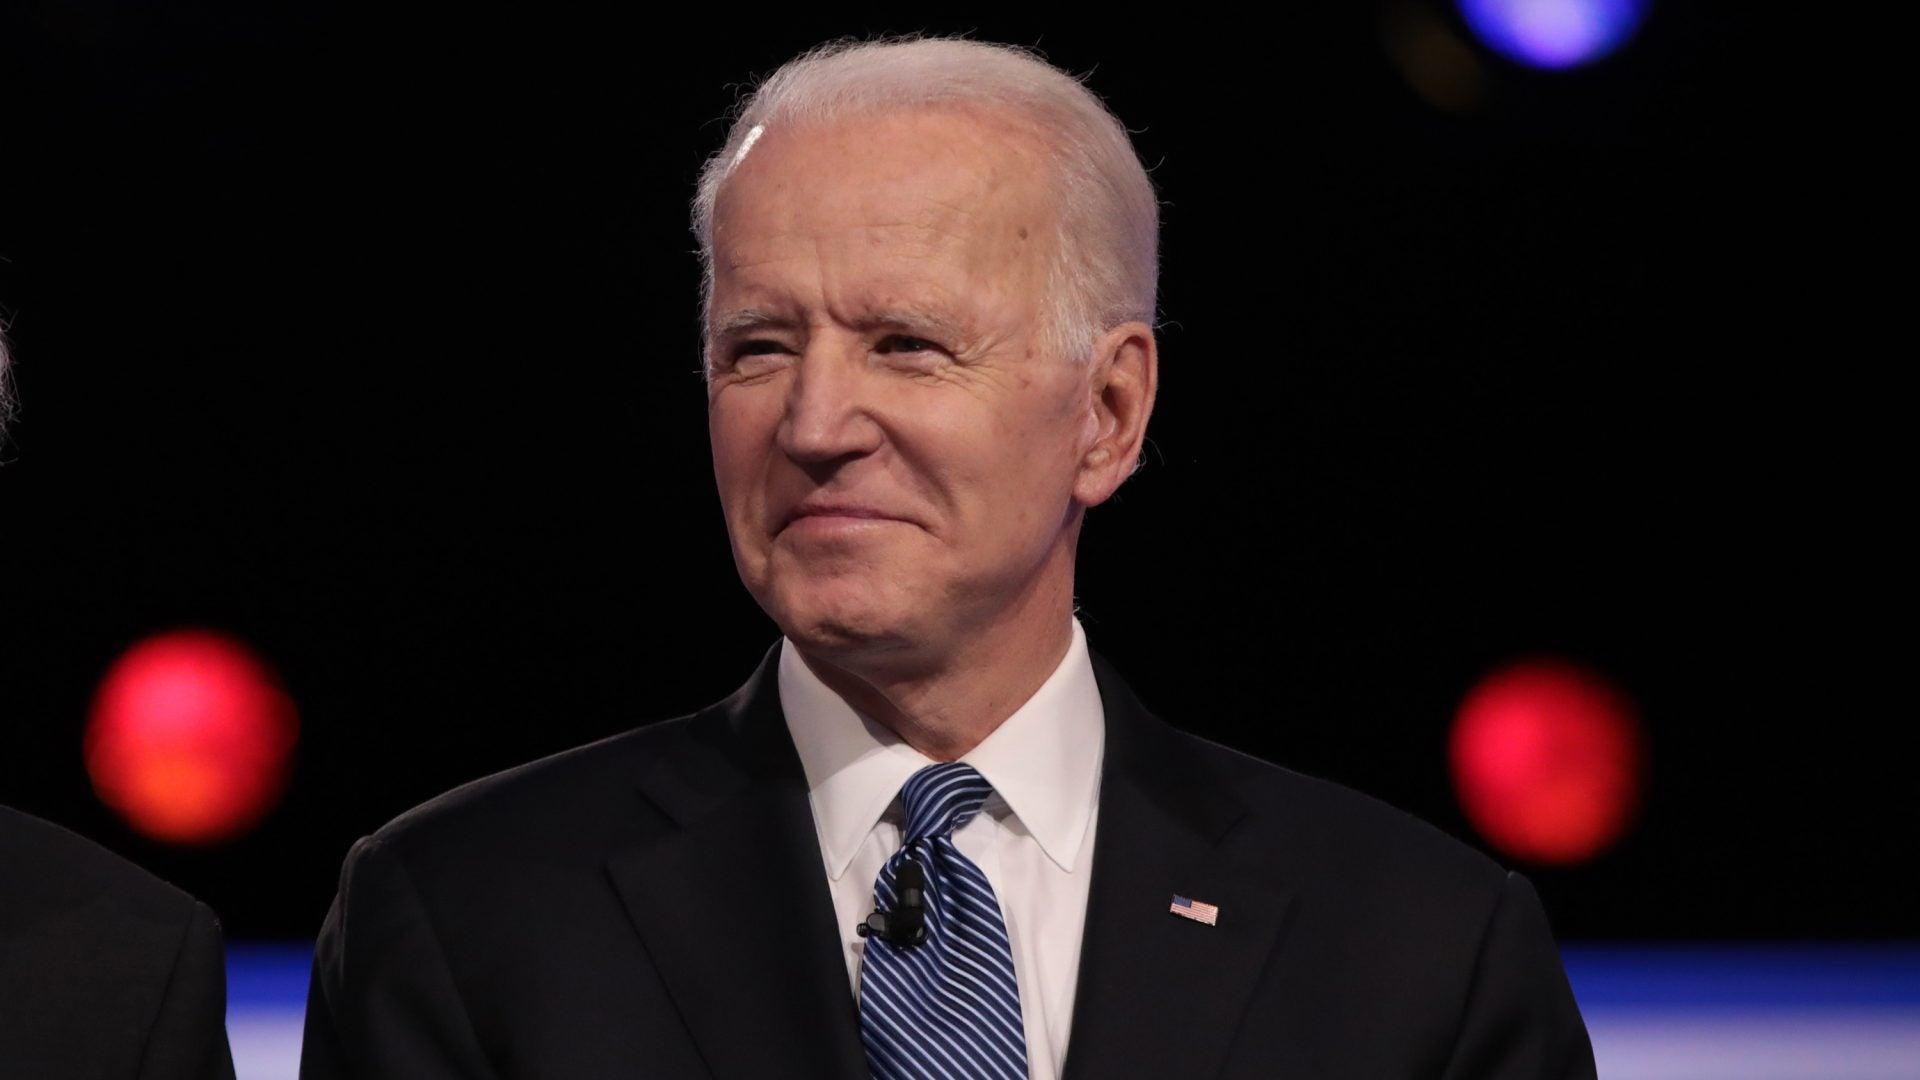 Op-Ed: Why I'm Voting For Joe Biden